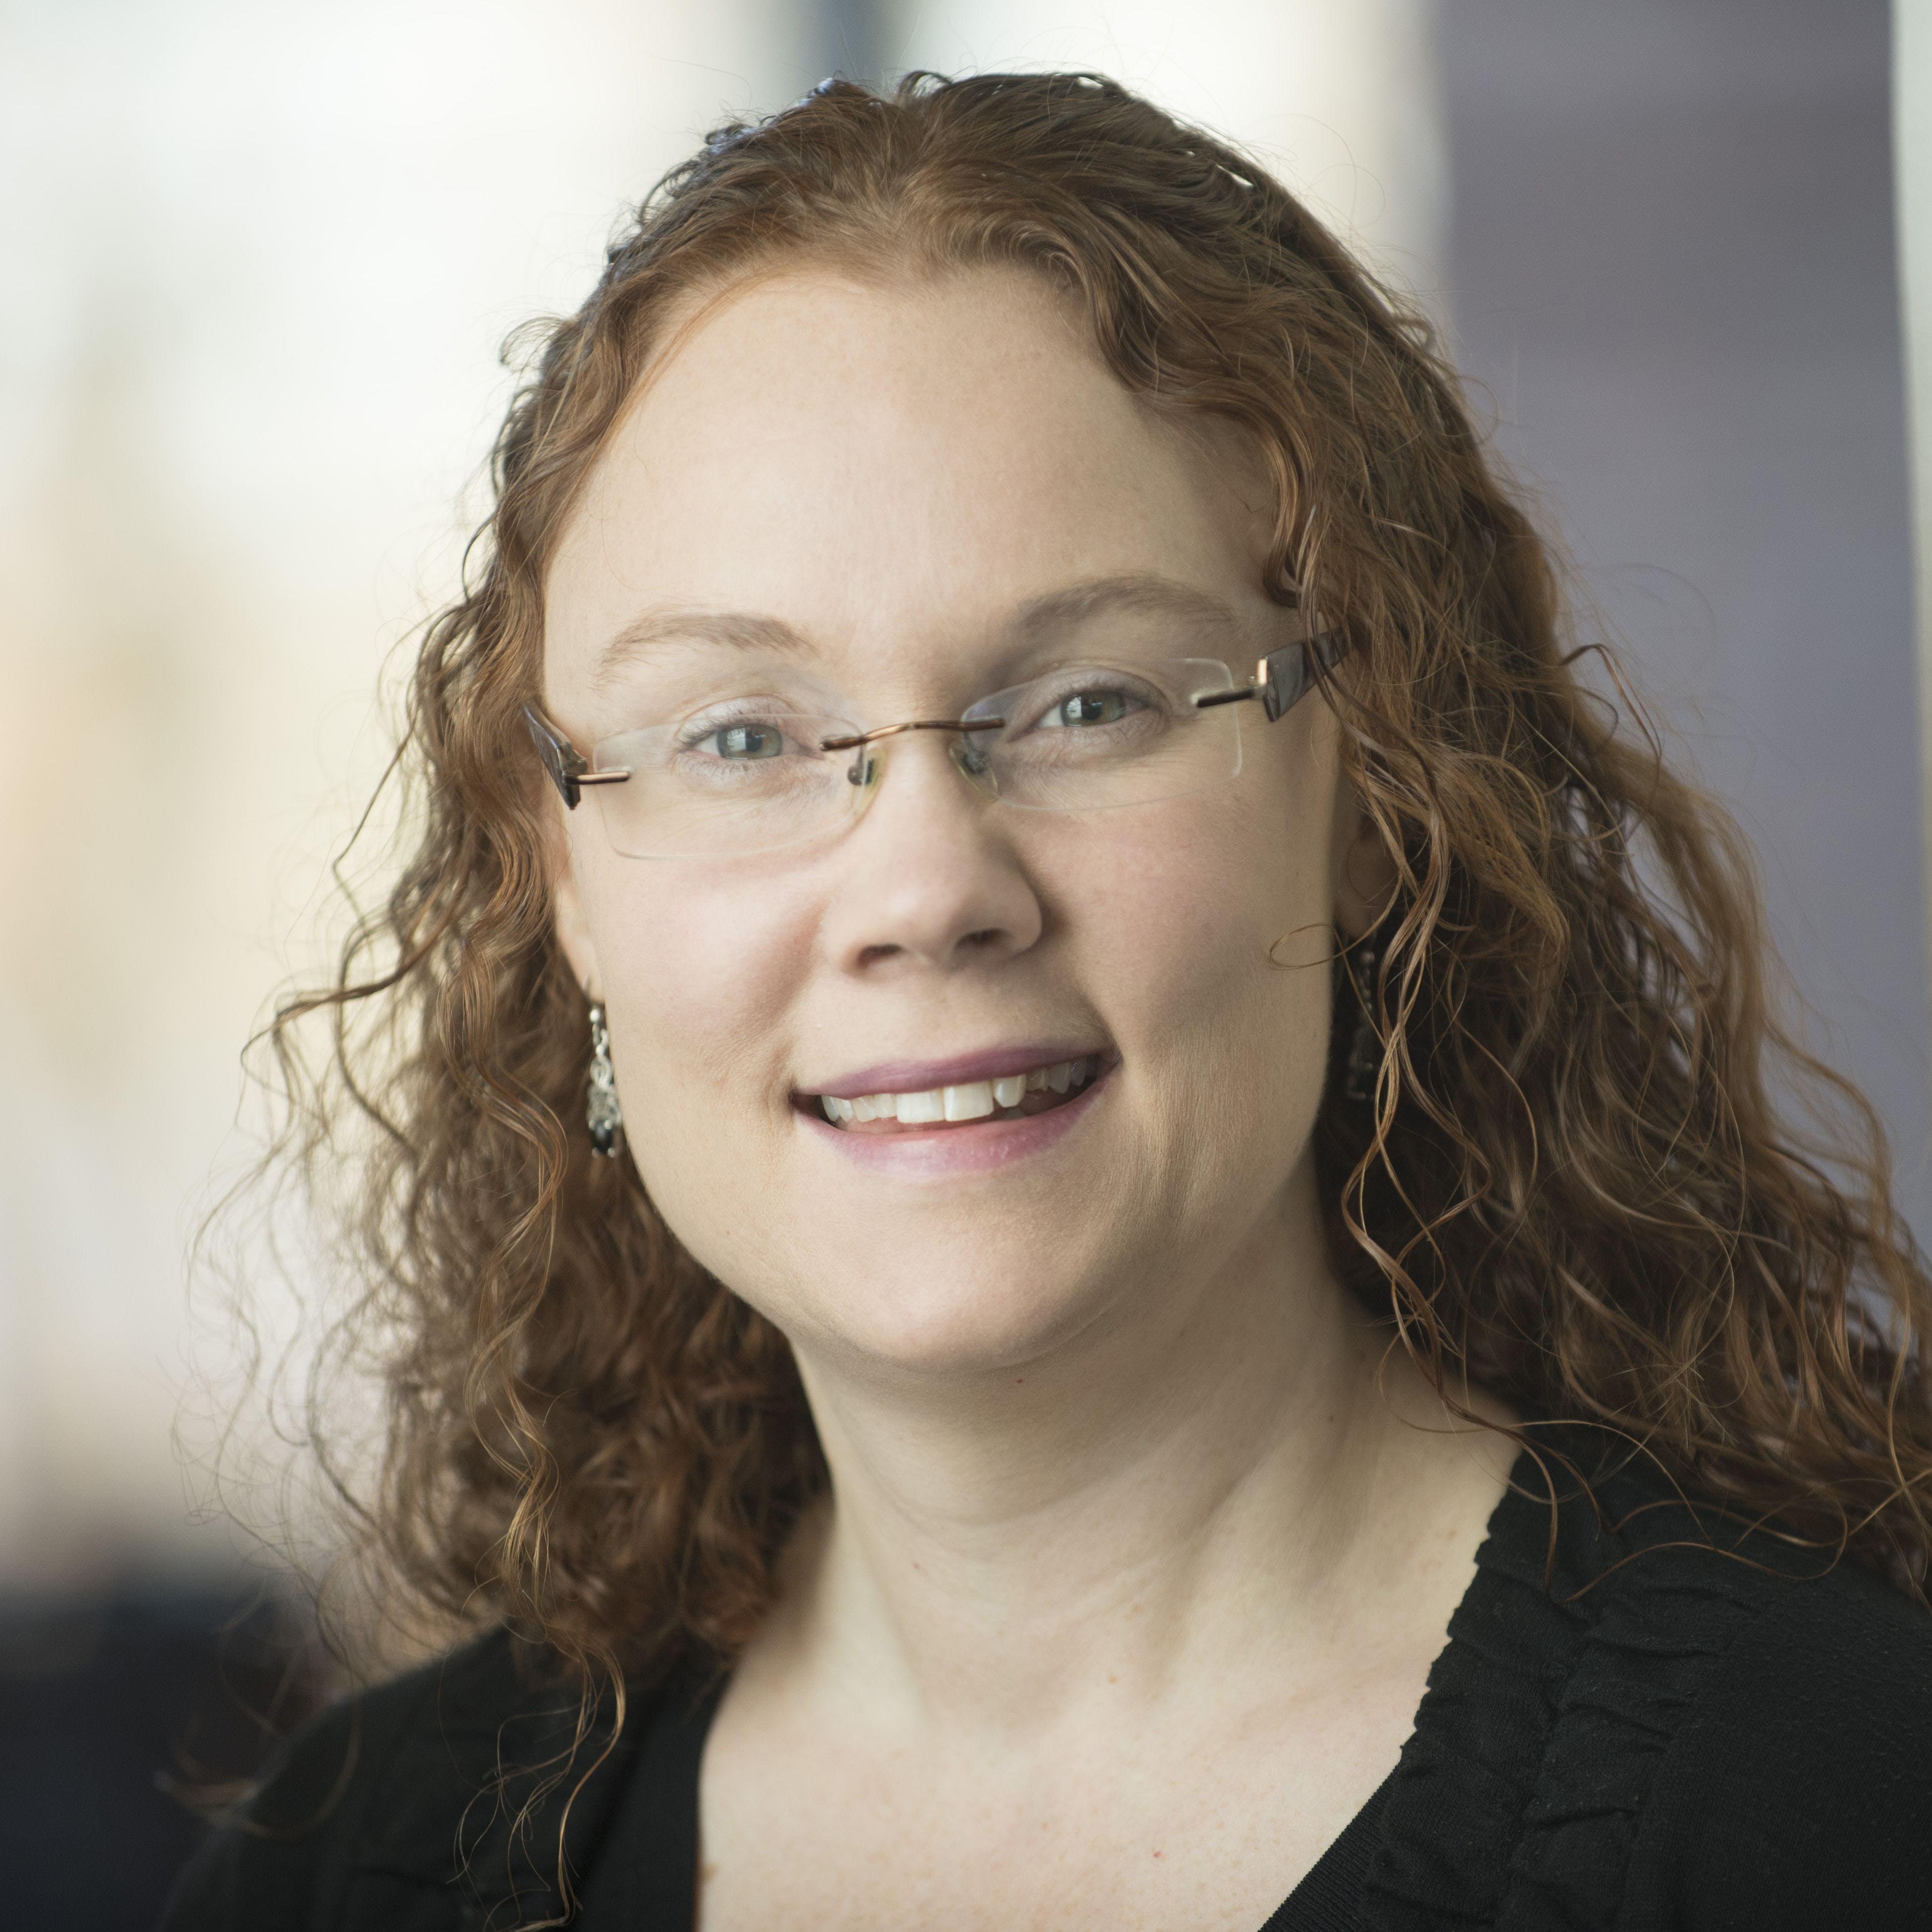 Angela Hanson